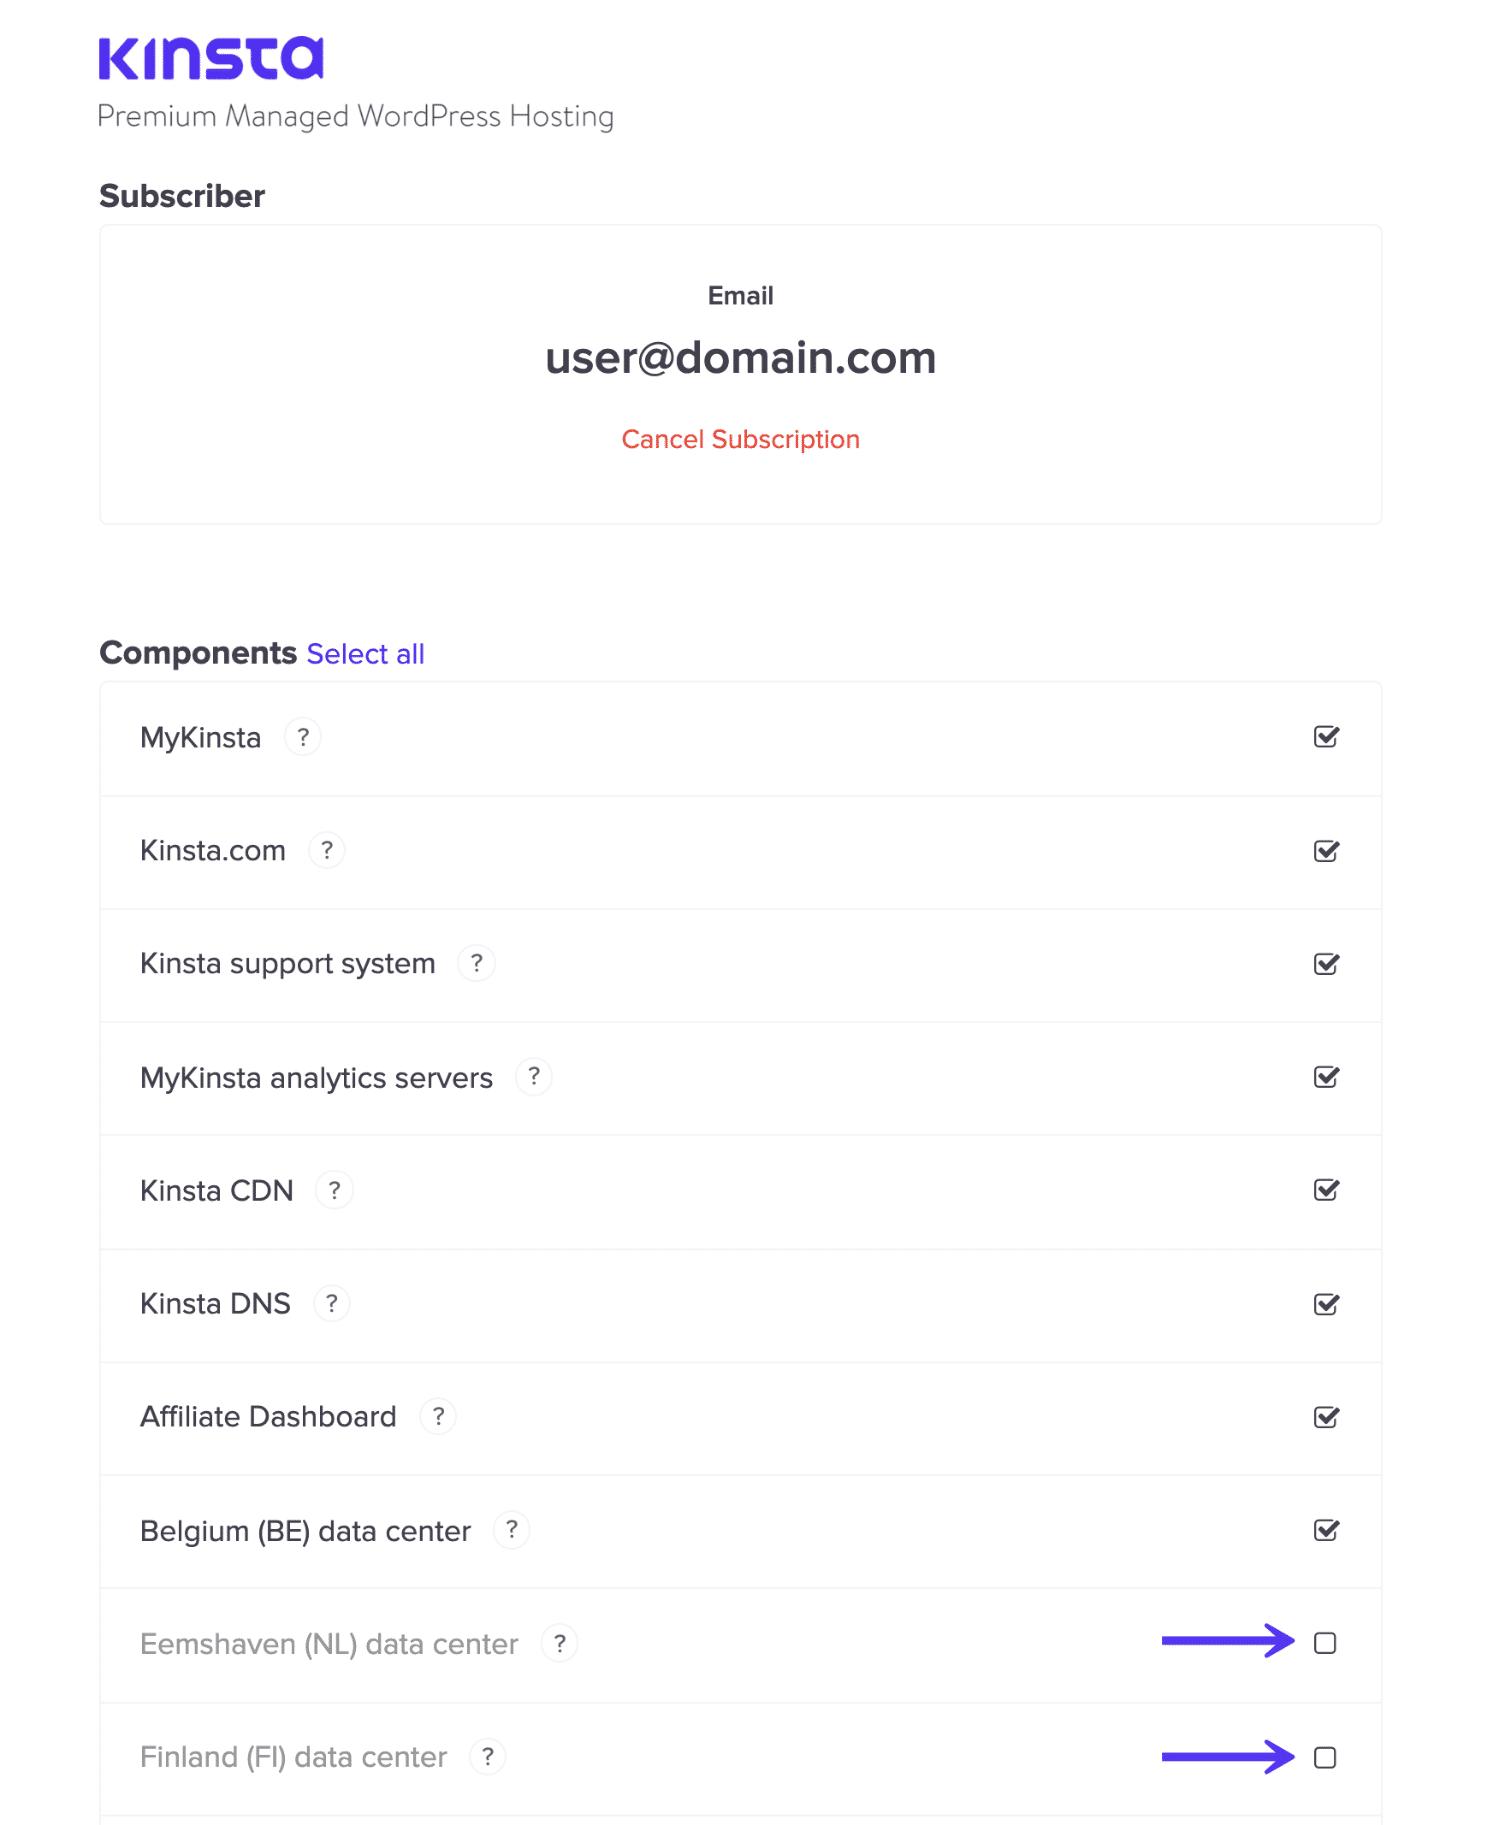 Escolha assinaturas da página de status Kinsta